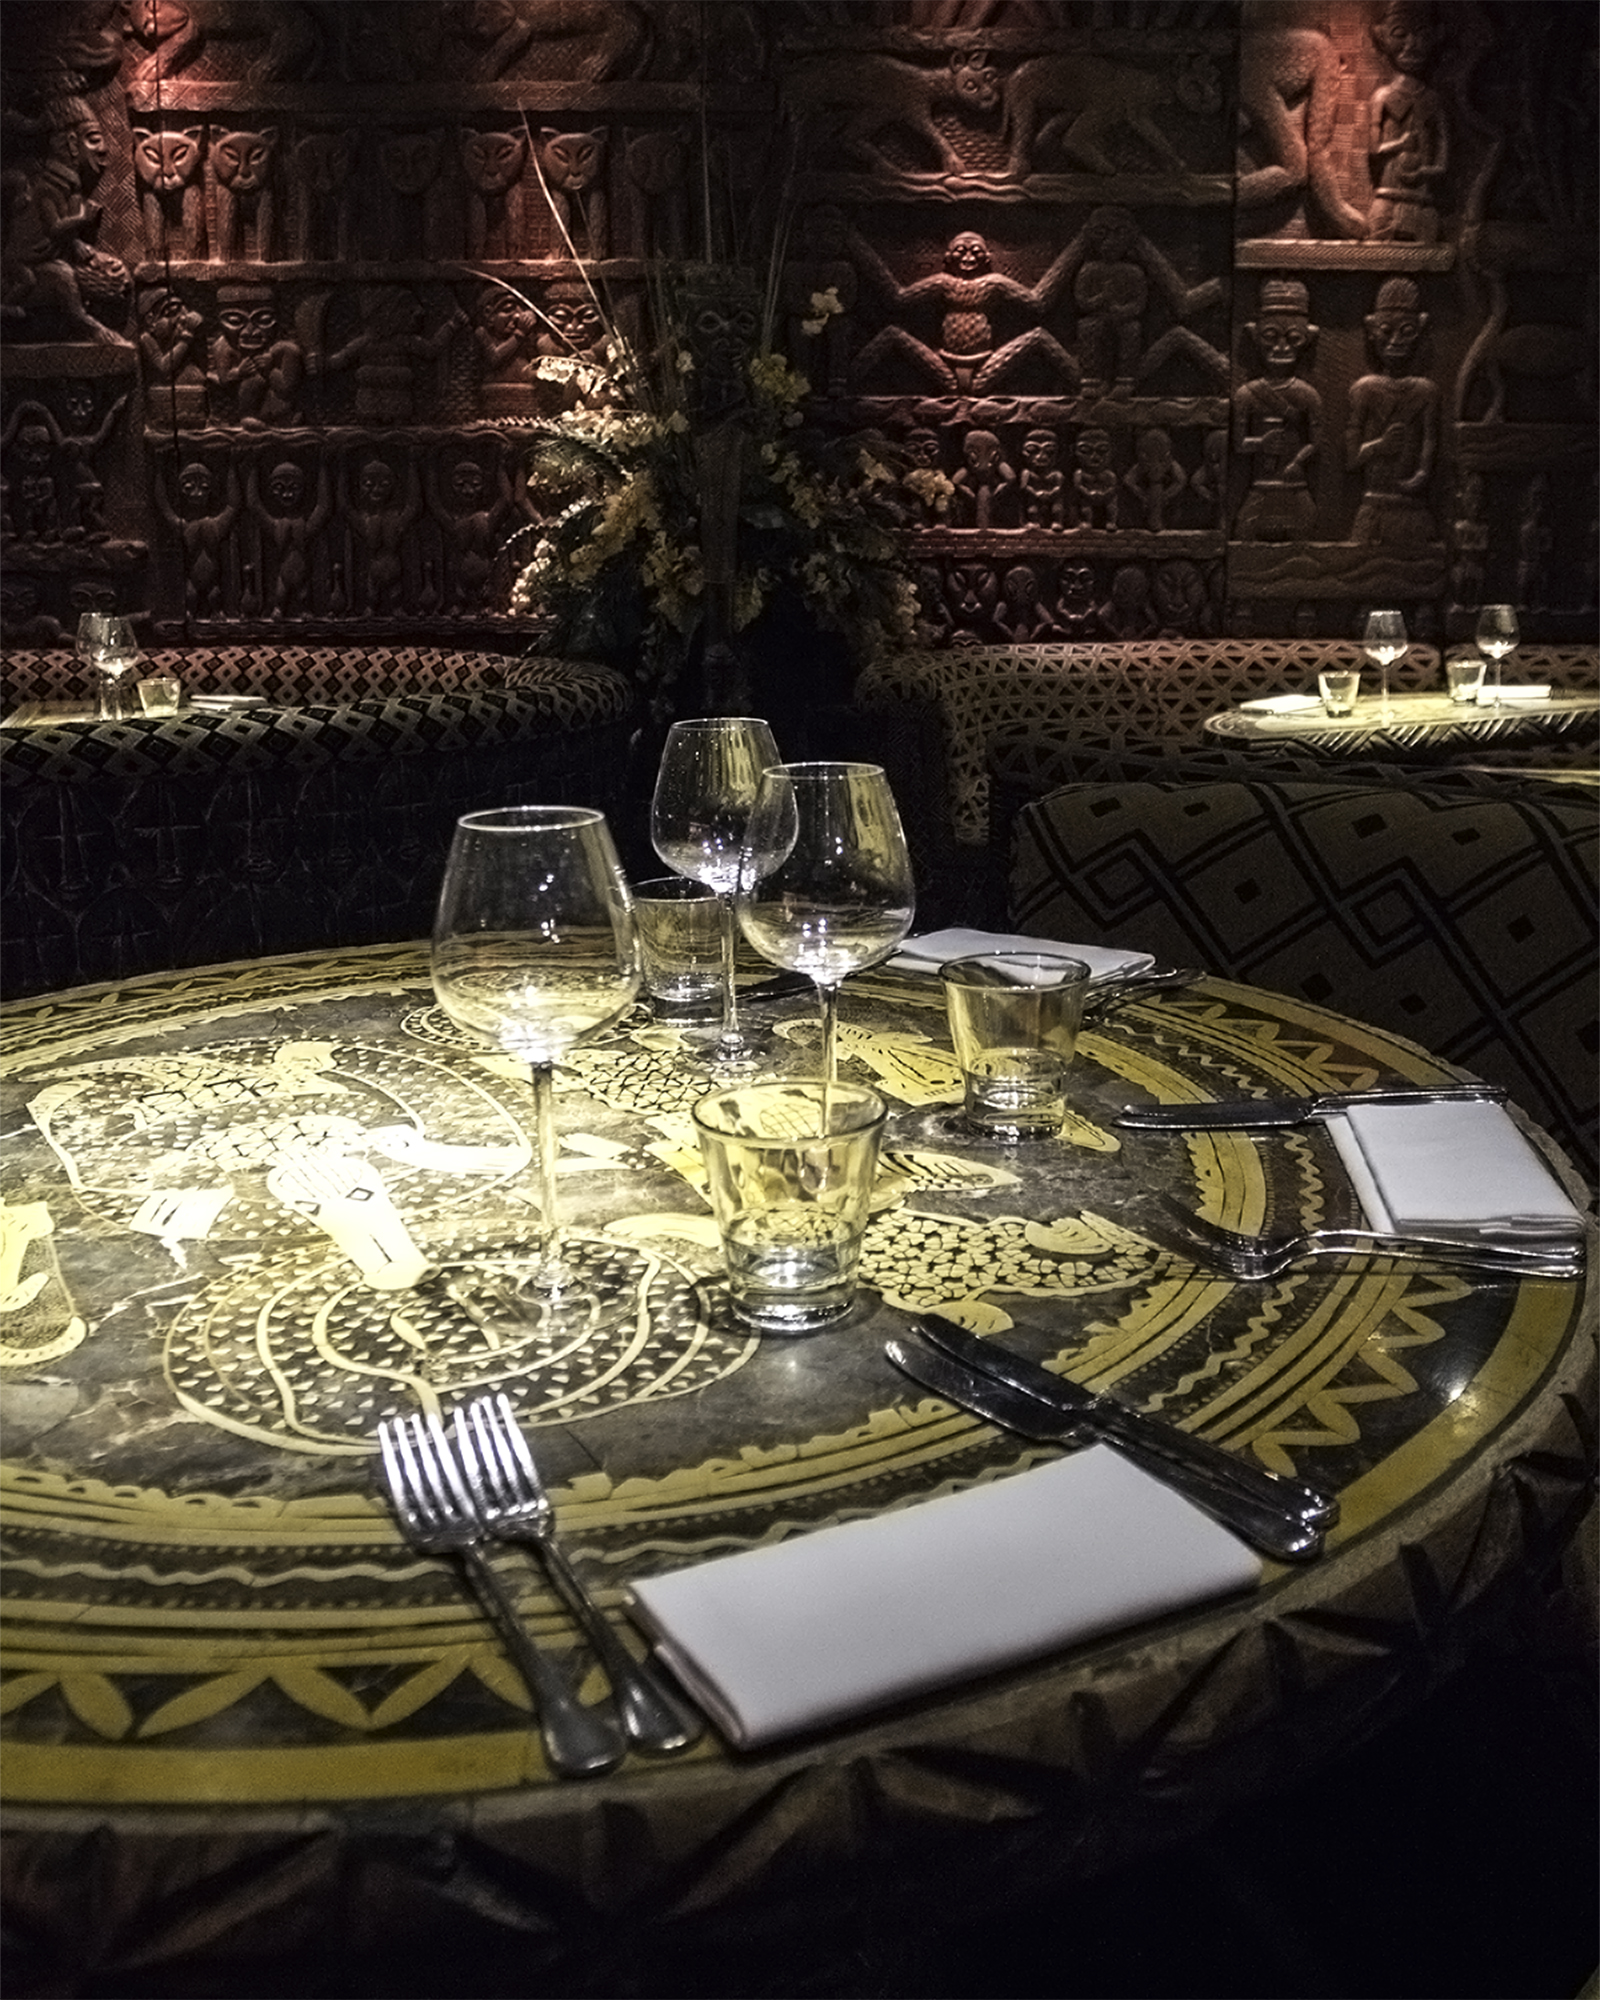 David_Rothwell_Shaka_Zulu_Restaurant_Table